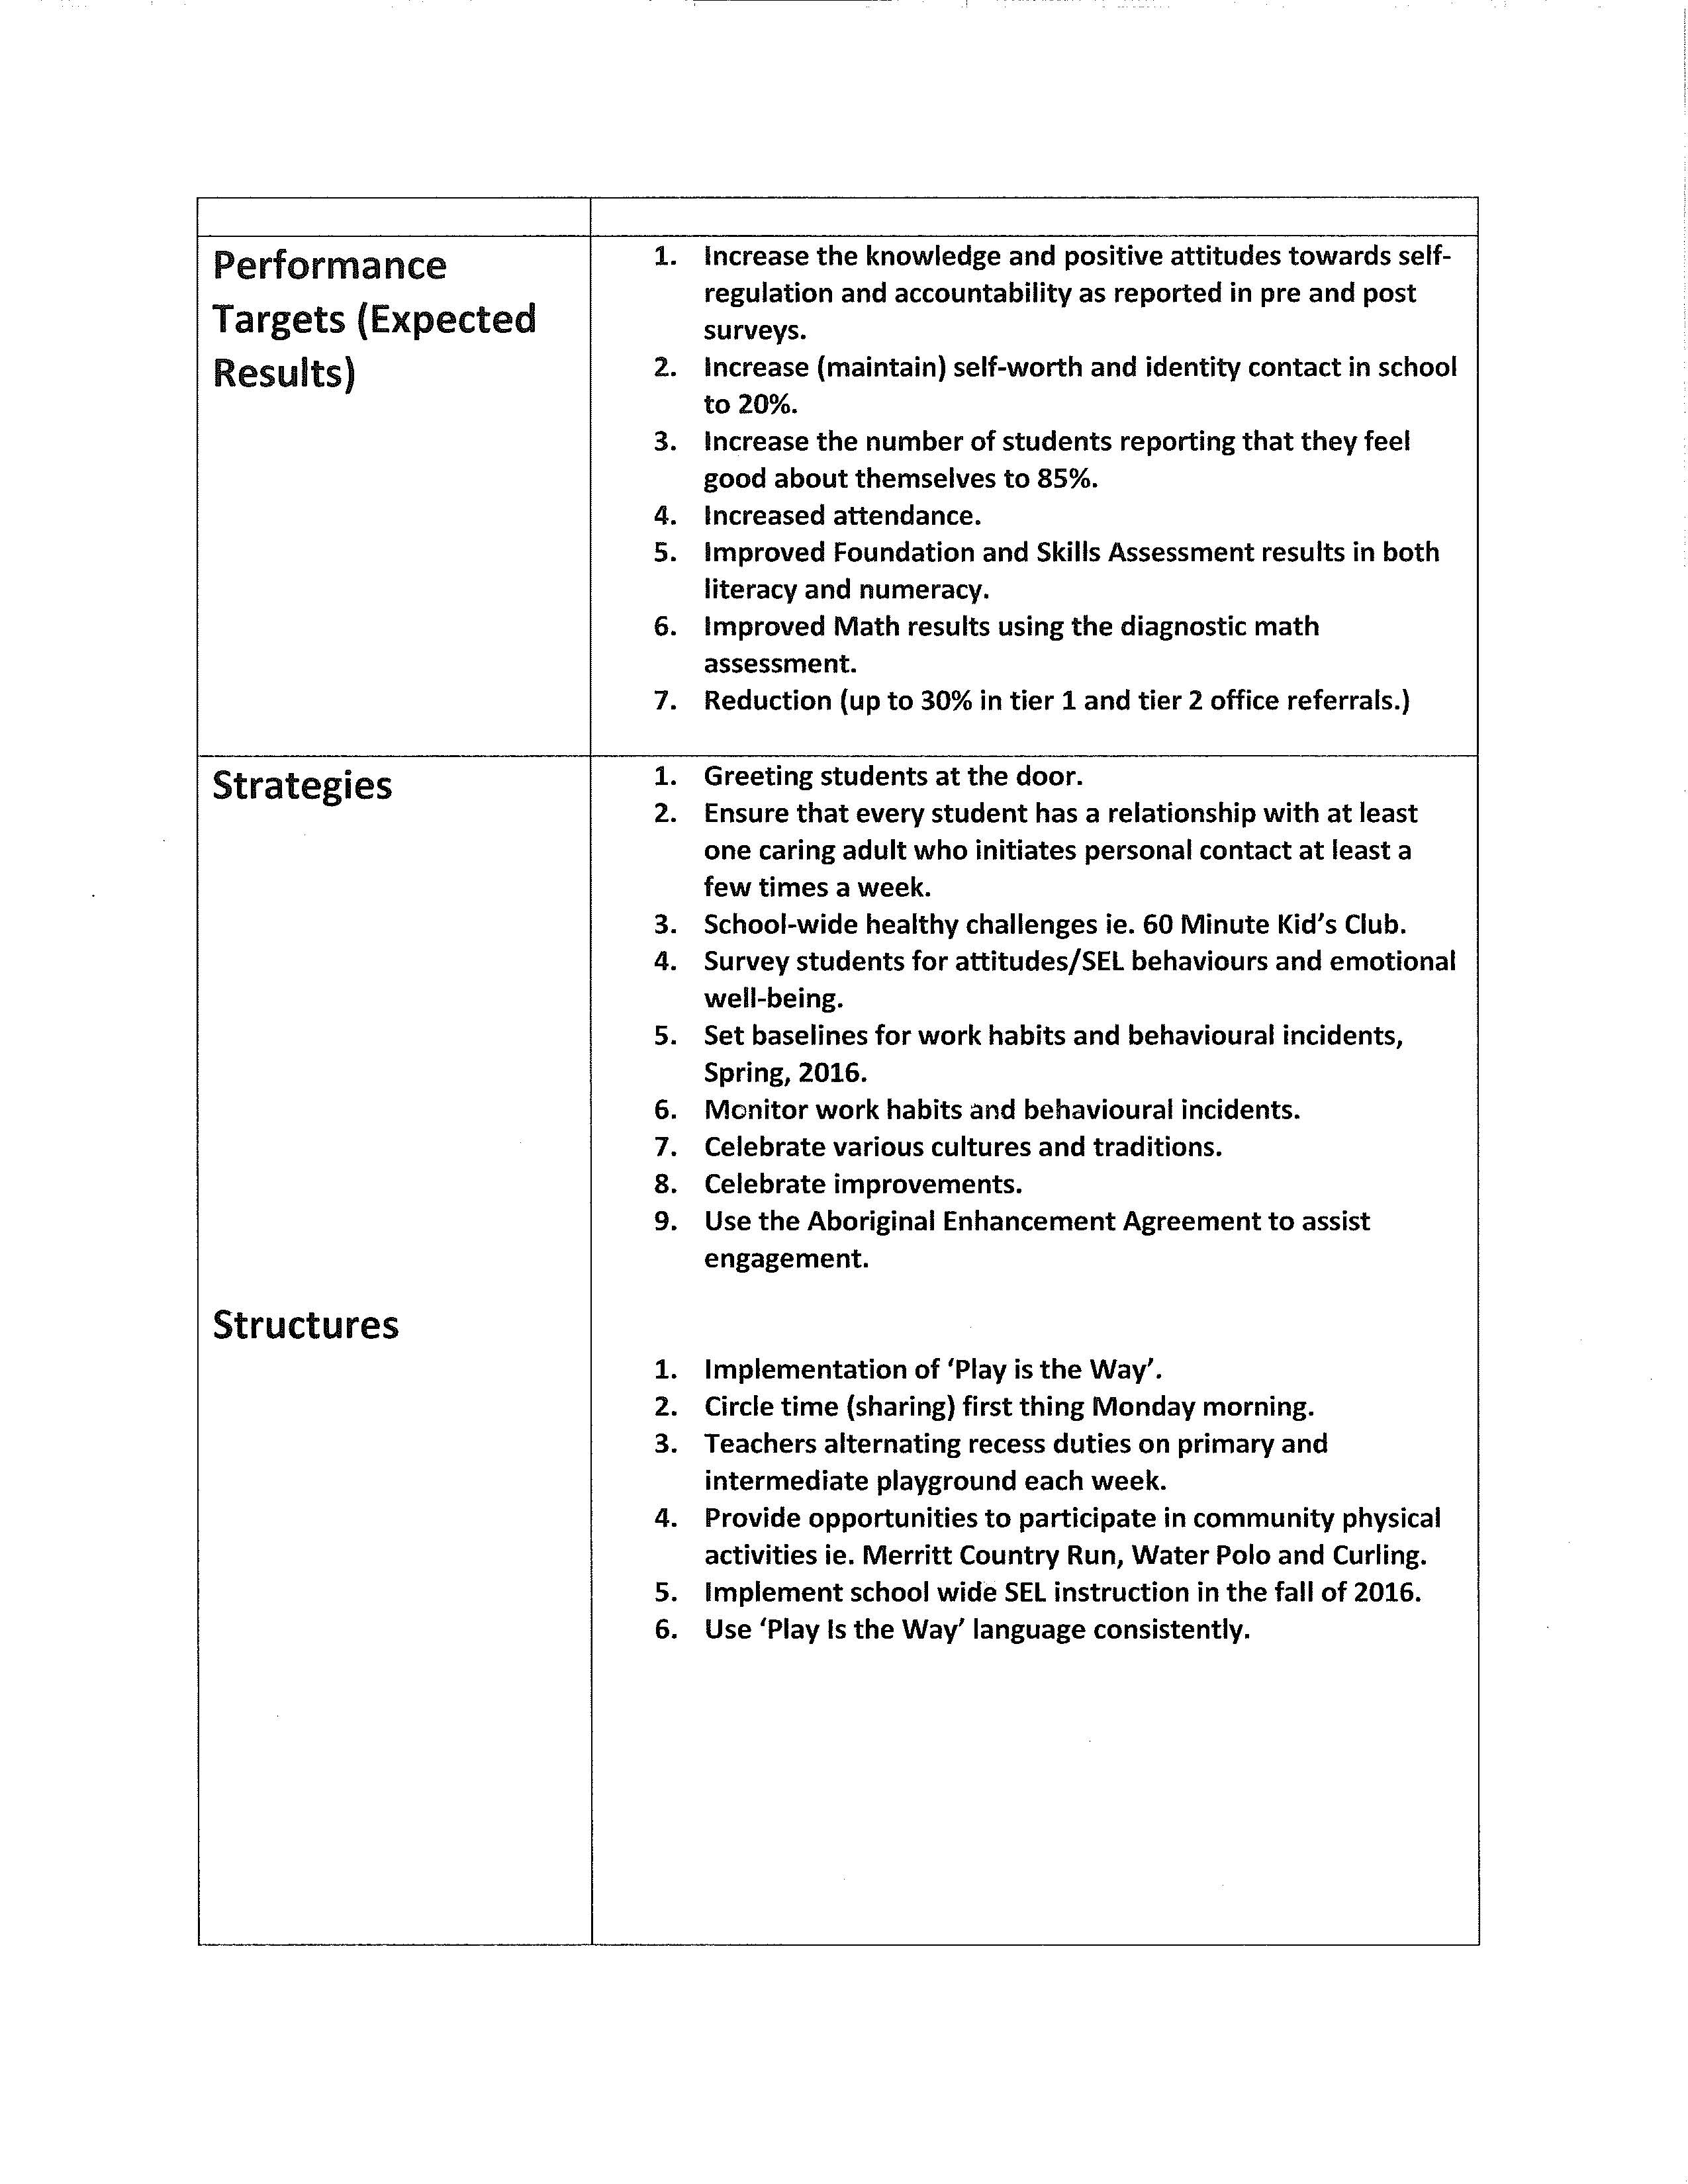 Enhancing Learning Plan_Page_2